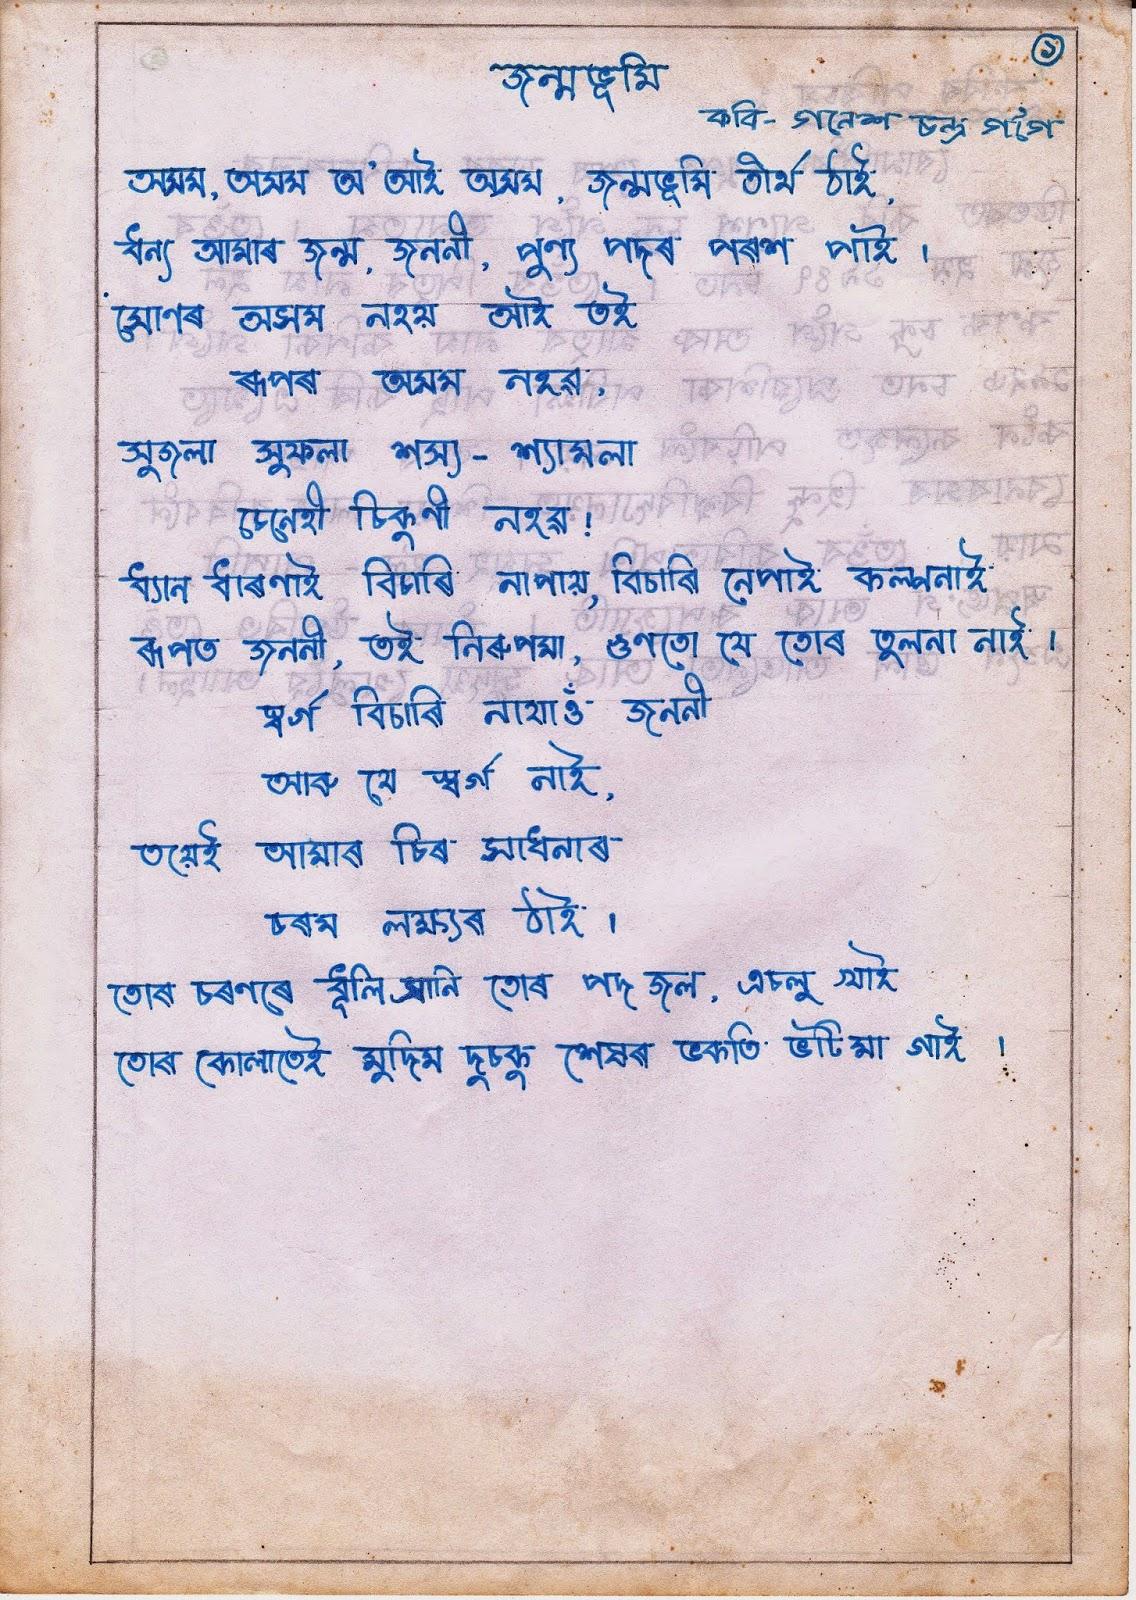 Swadesh prem Research paper Sample - September 2019 - 1761 words